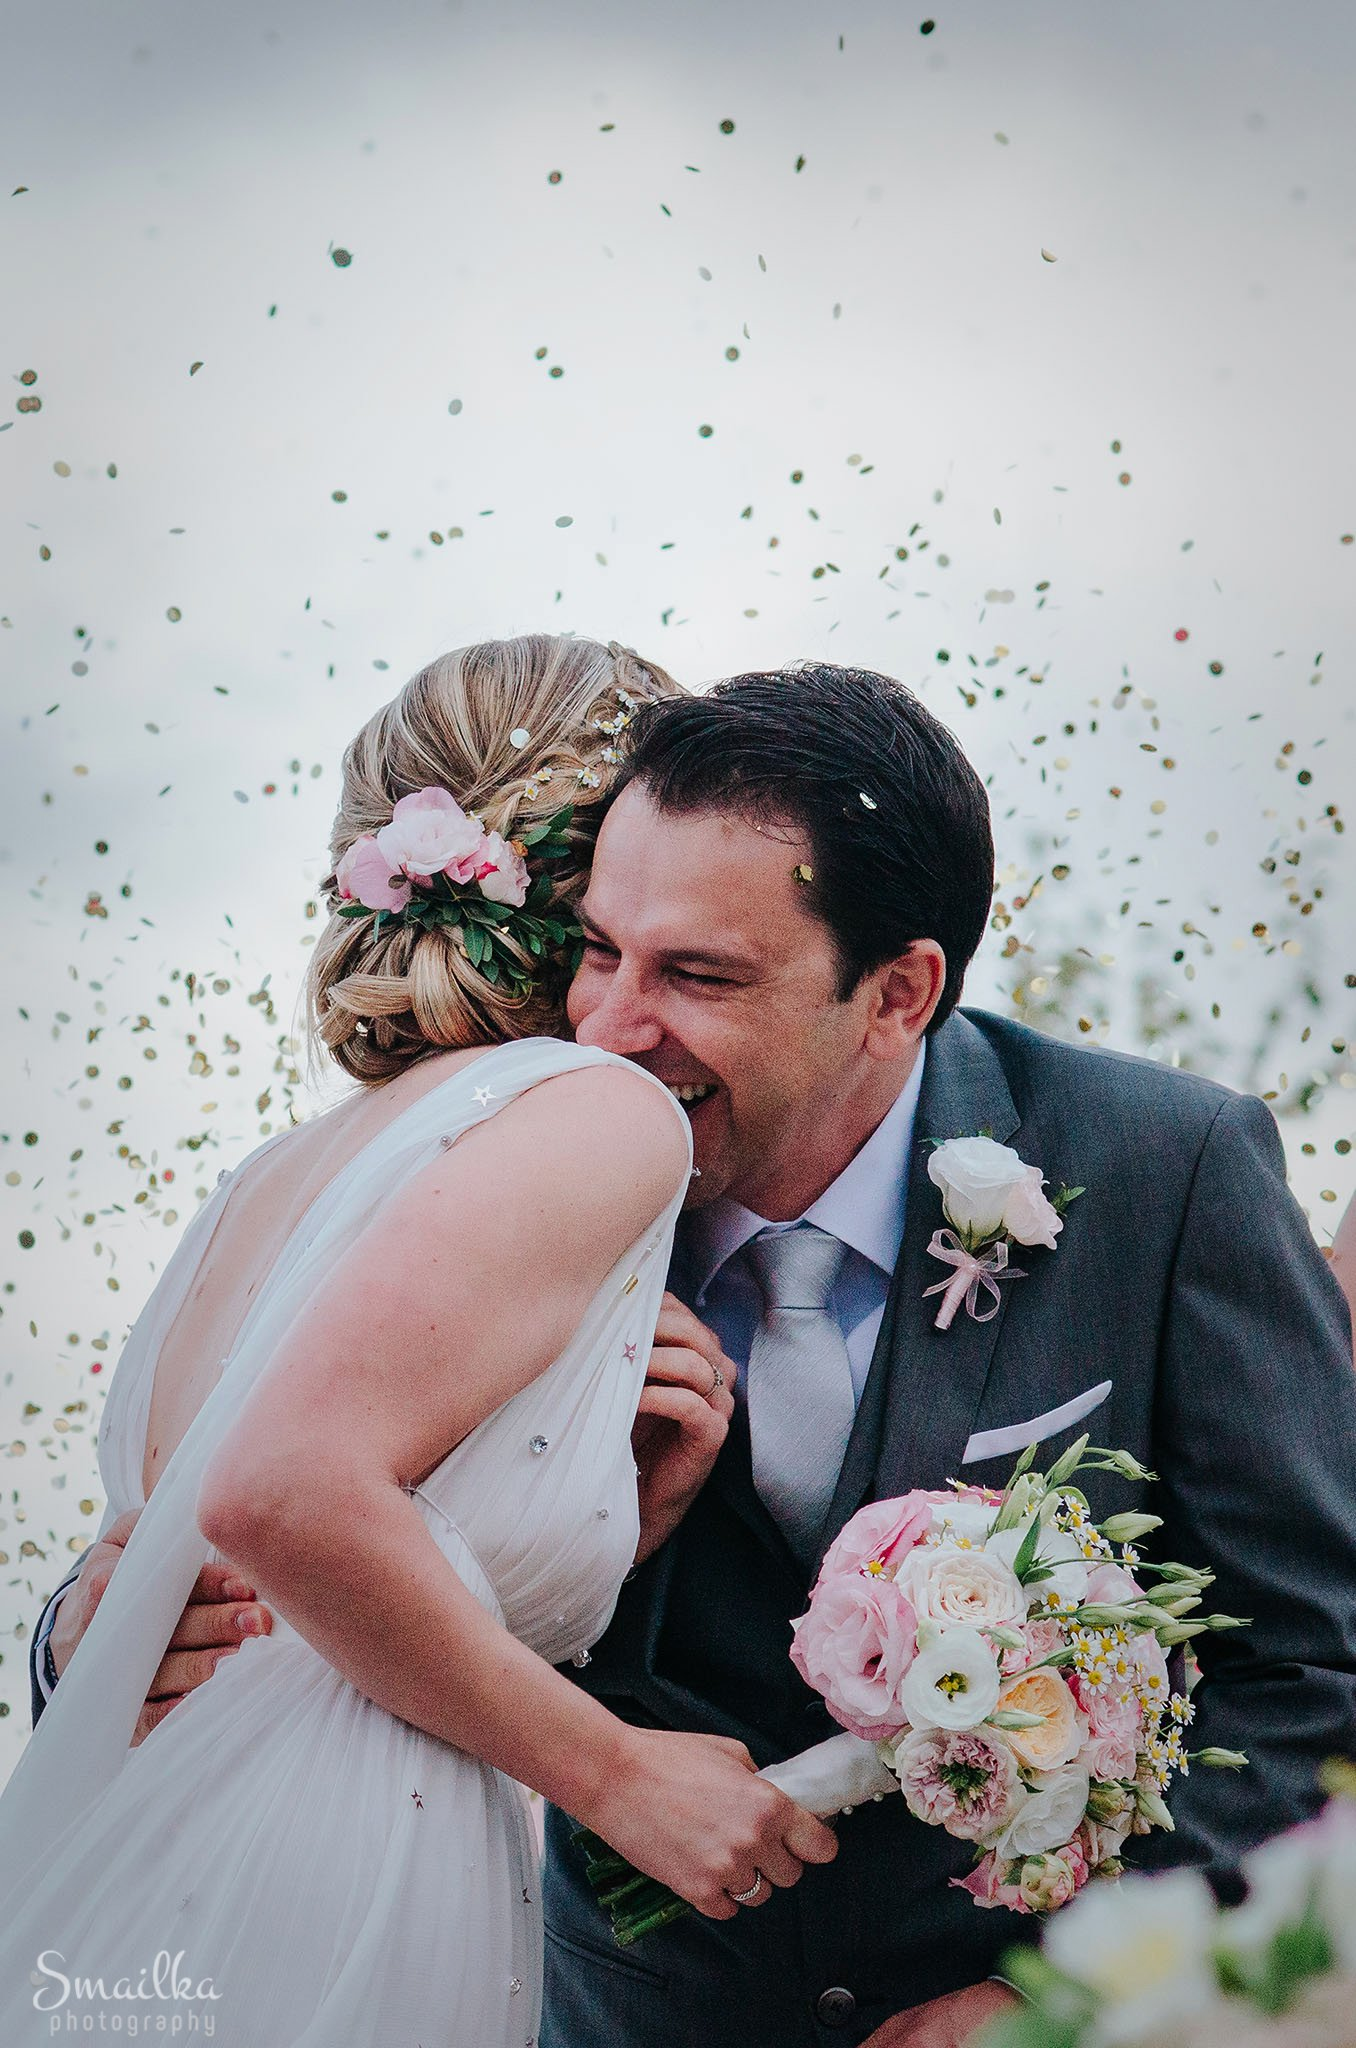 Ana and Boz happily married at Black Sea Rama